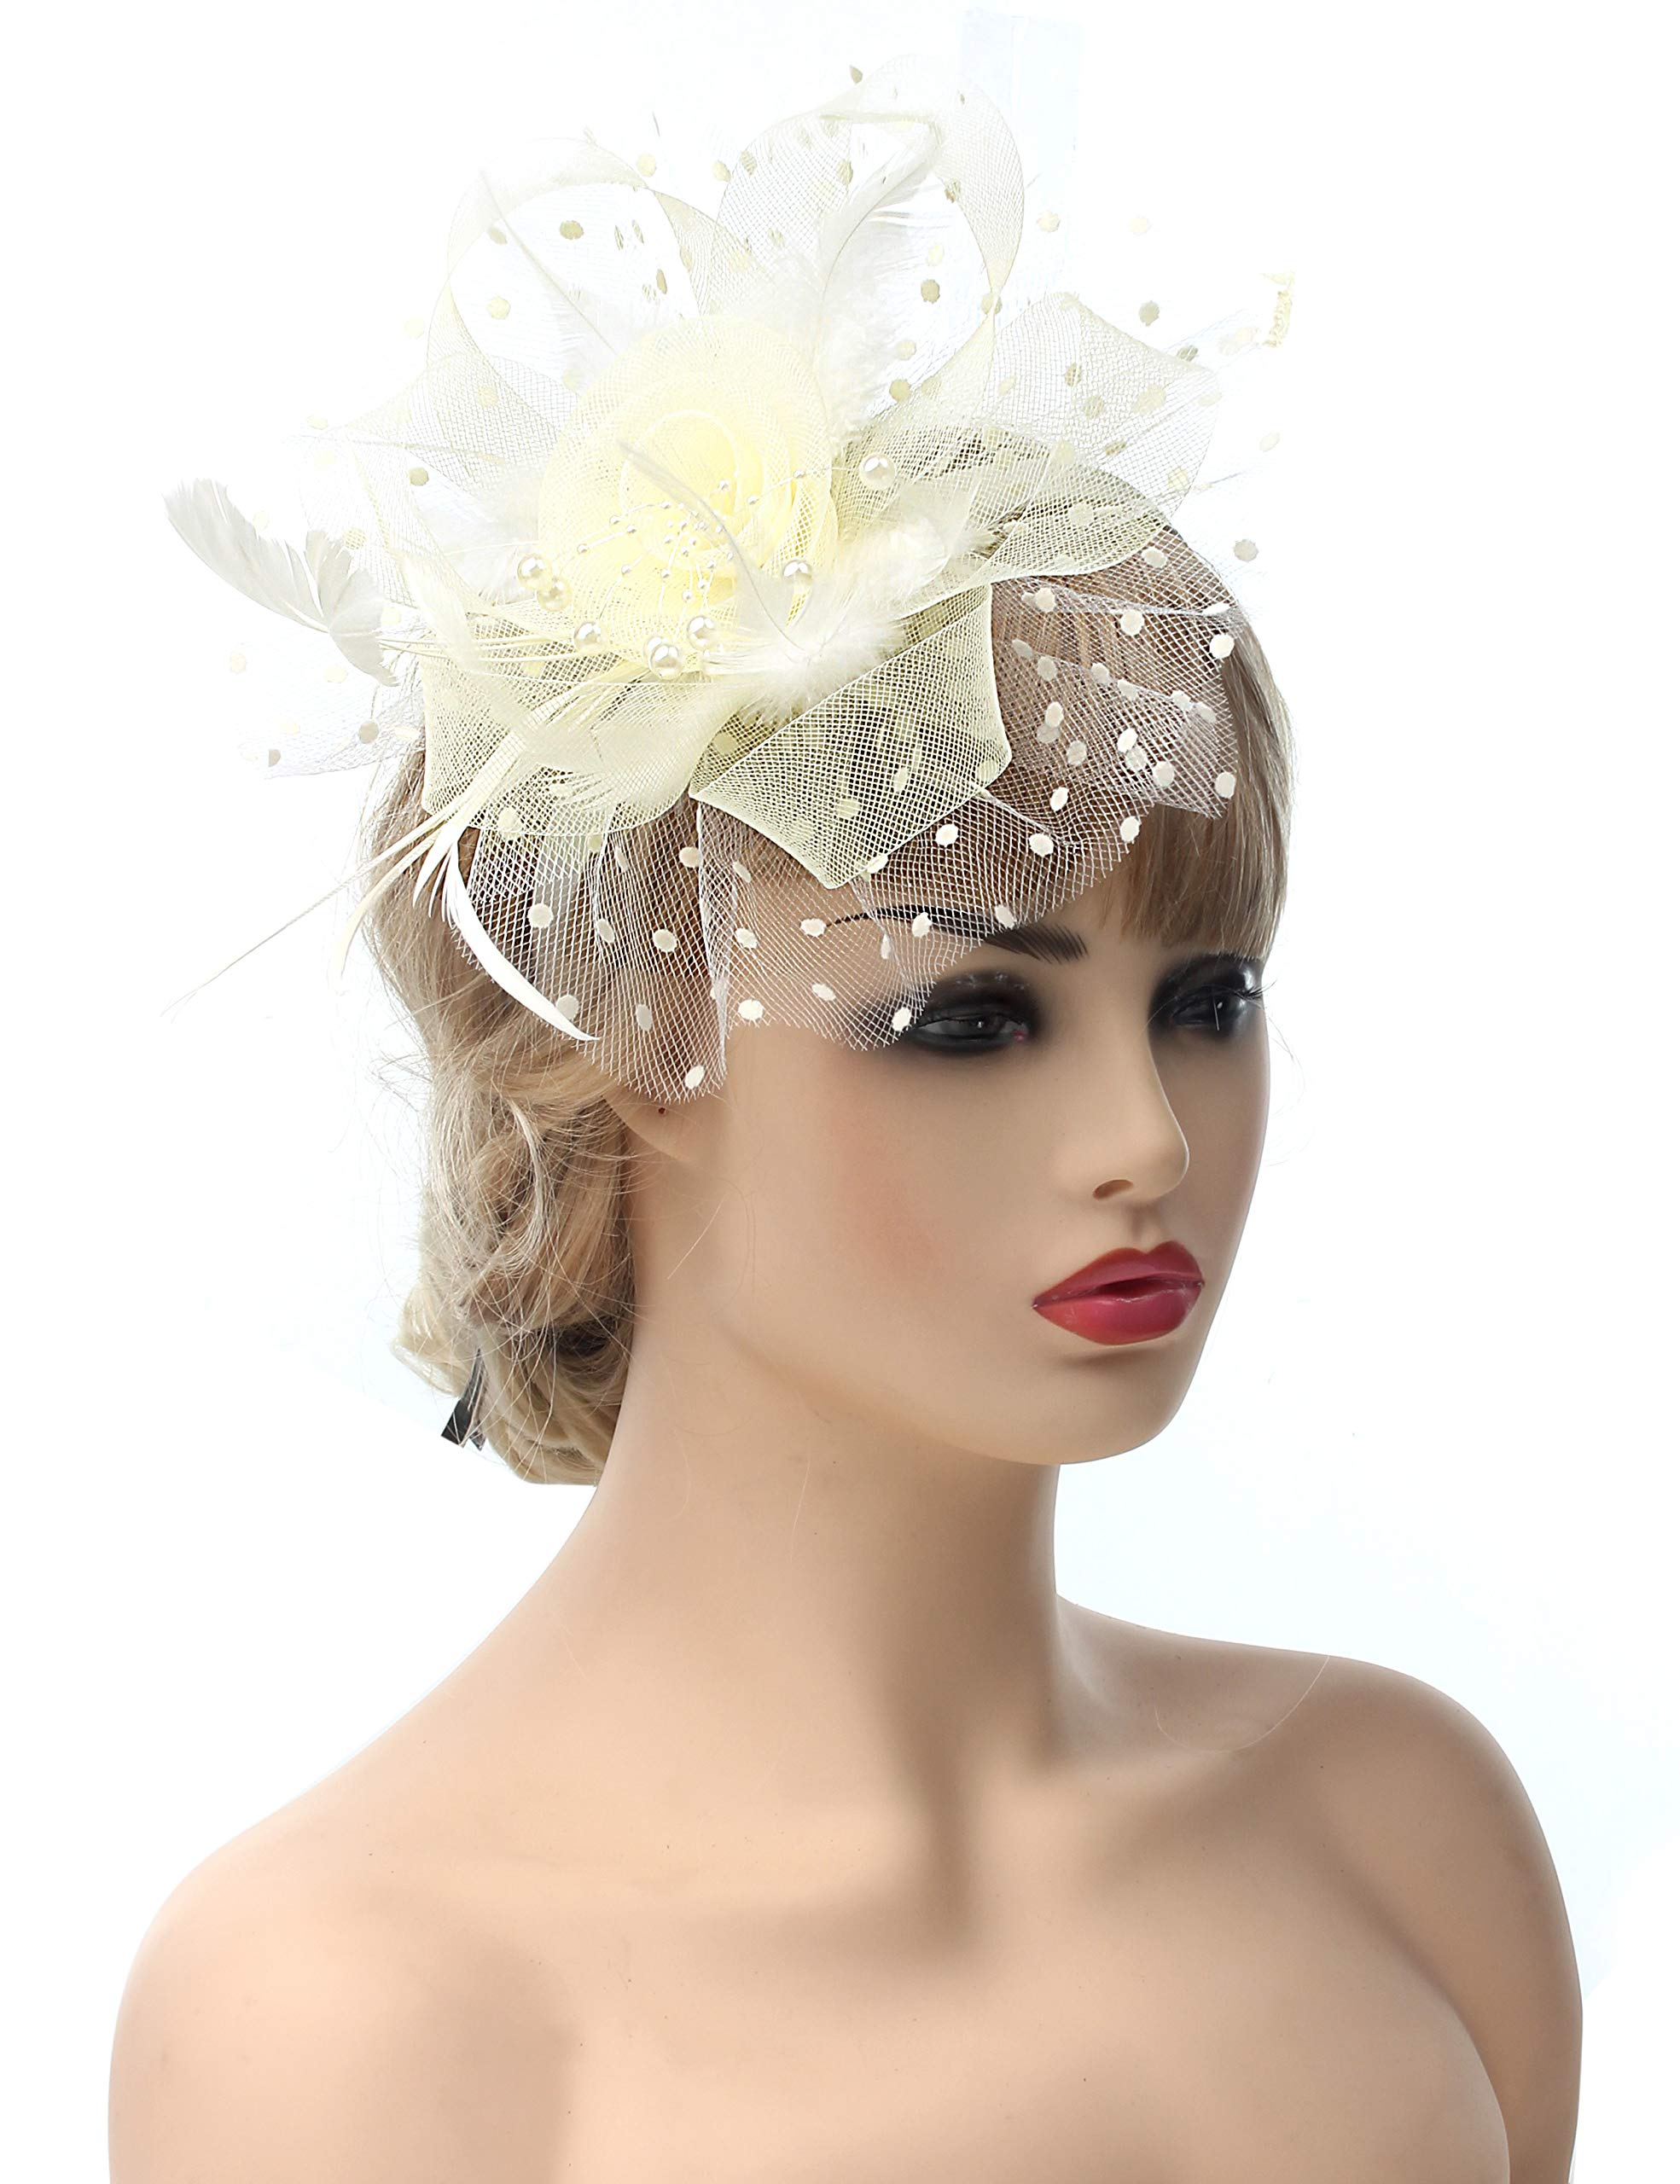 Myjoyday Fascinators Hat for Women Tea Party Headband Kentucky Derby Wedding Cocktail Flower Mesh Feathers Hair Clip (Beige-2)